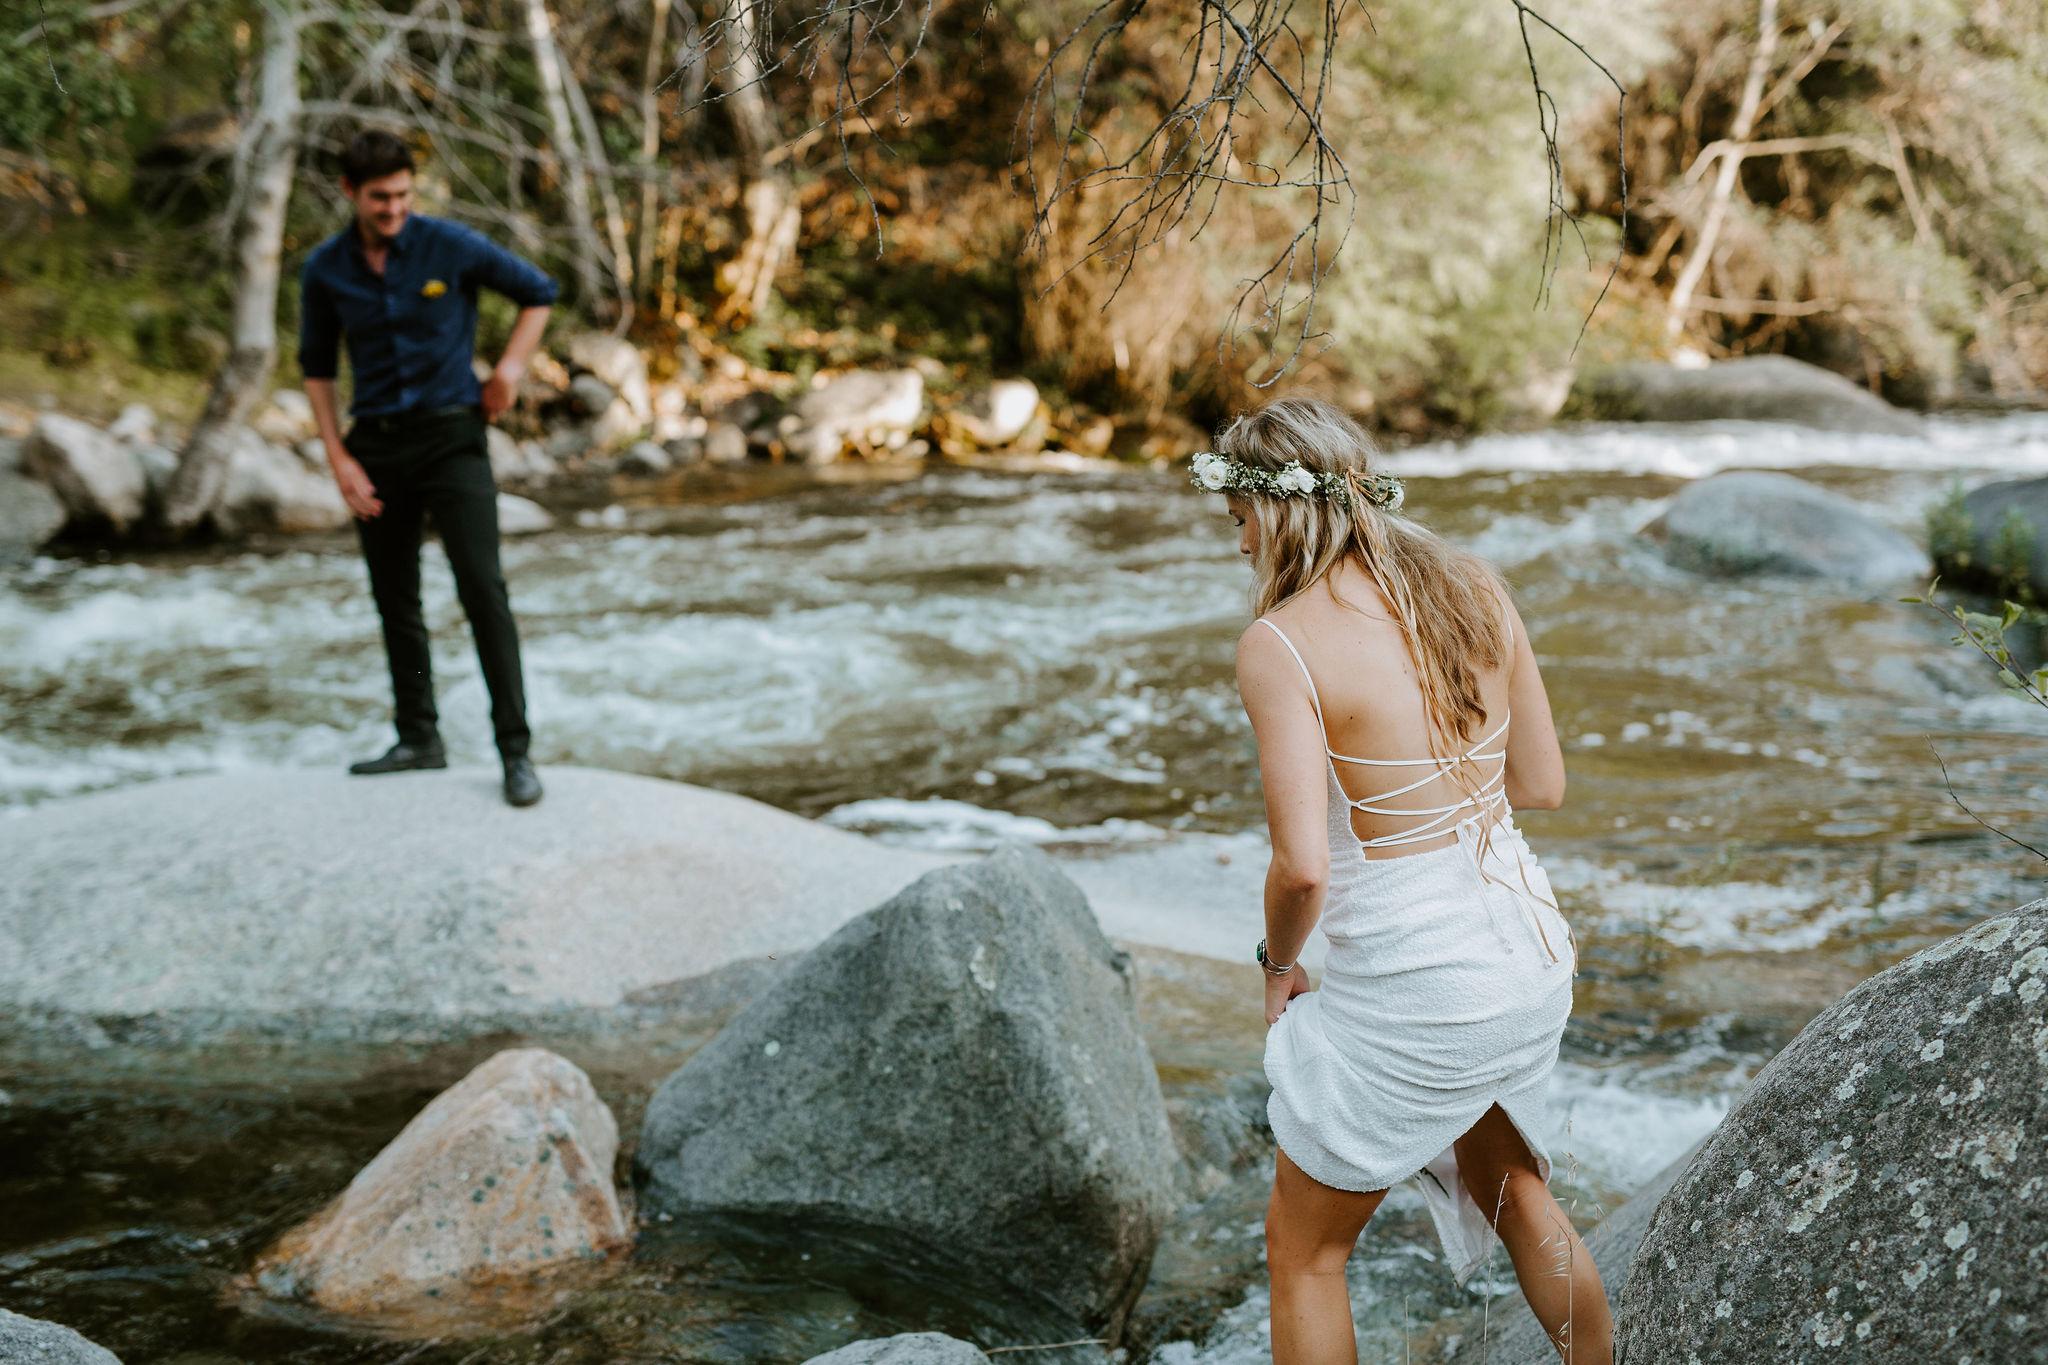 RedwoodRanch_Geoff&LyndsiPhotography_Mike&Amanda_Romantics65.jpg